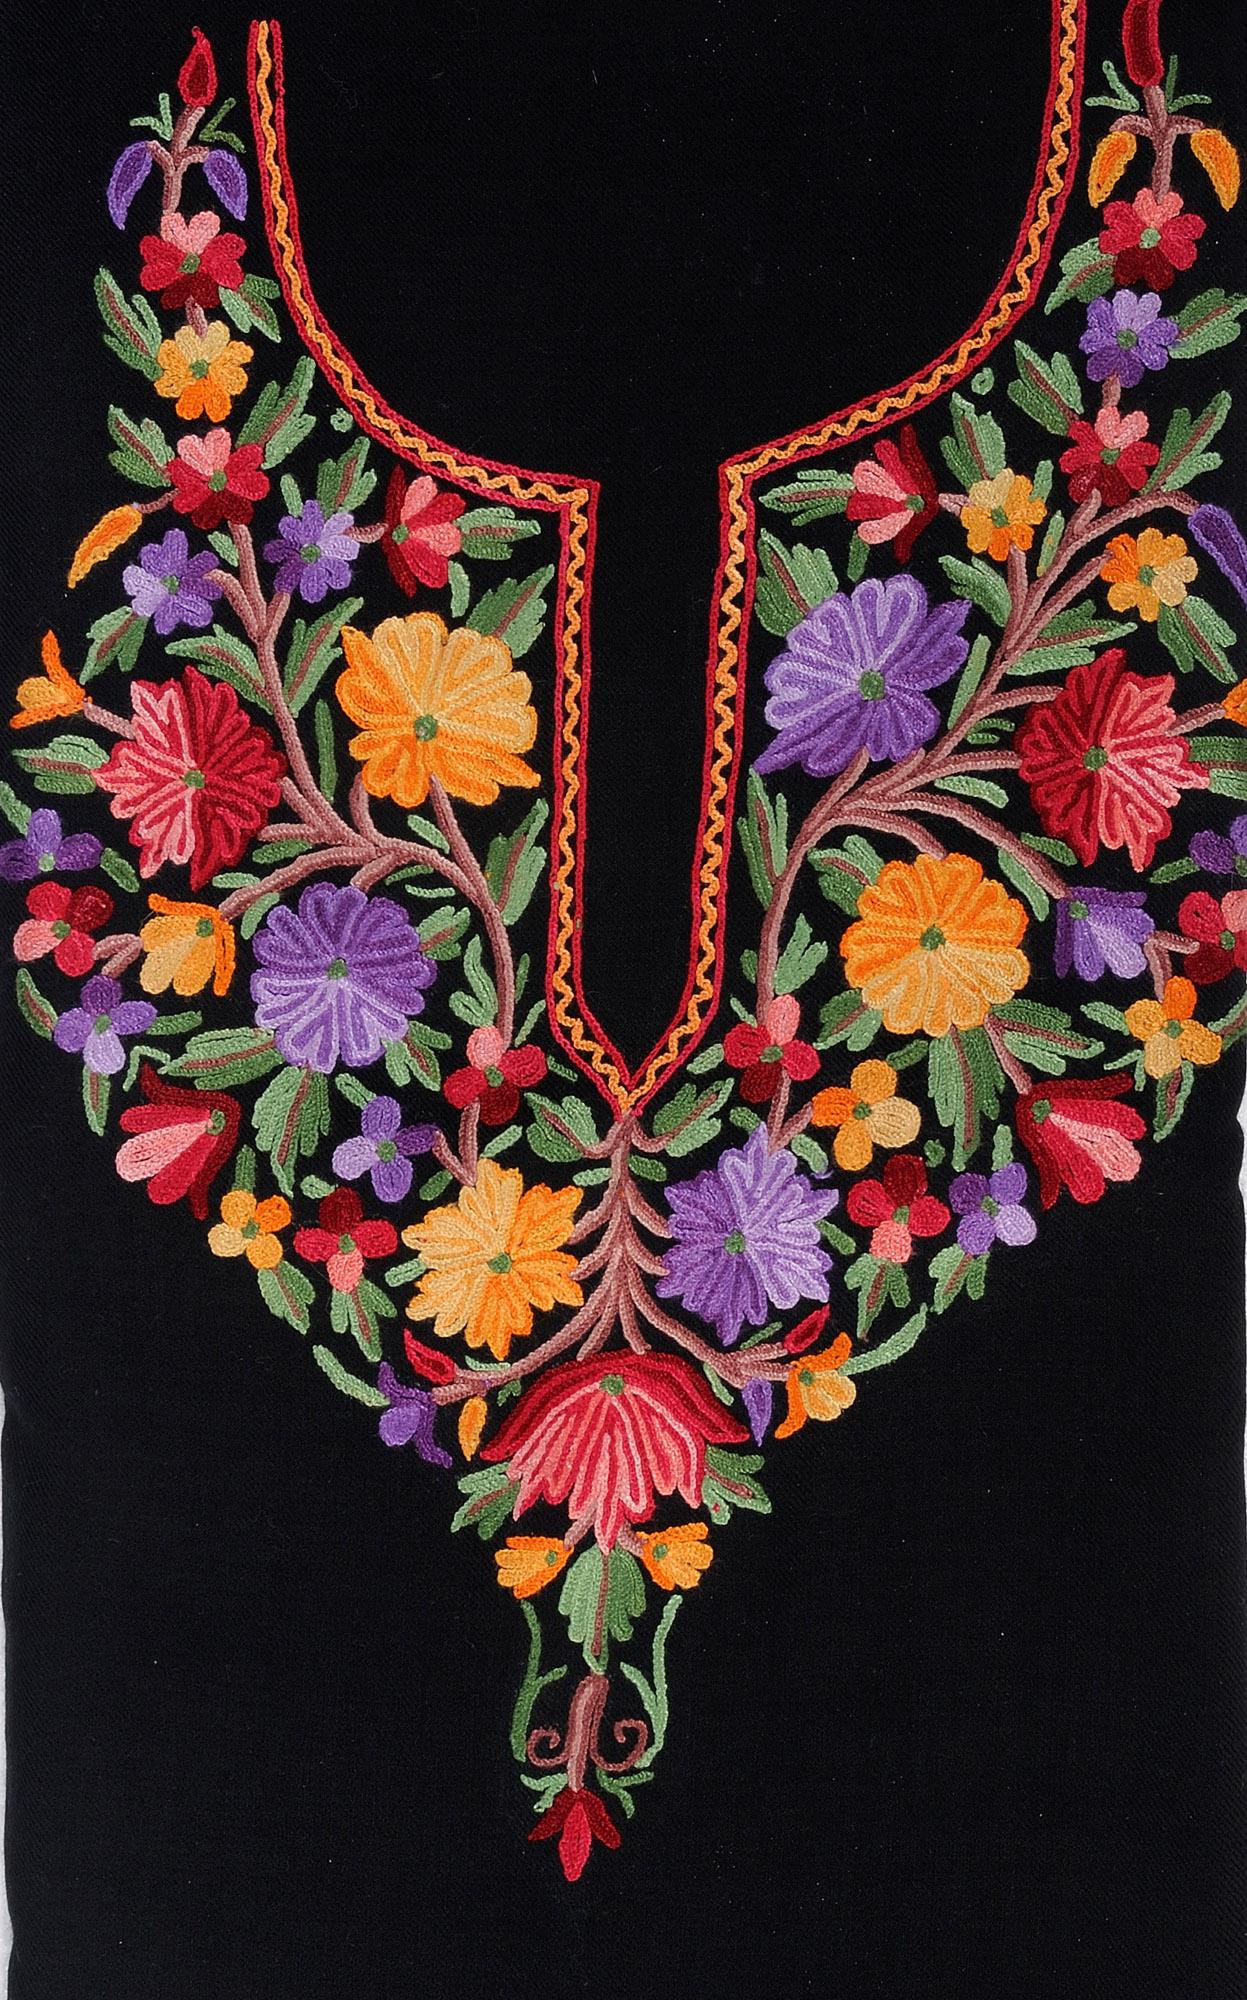 Black TwoPiece Salwar Kameez Fabric From Kashmir With